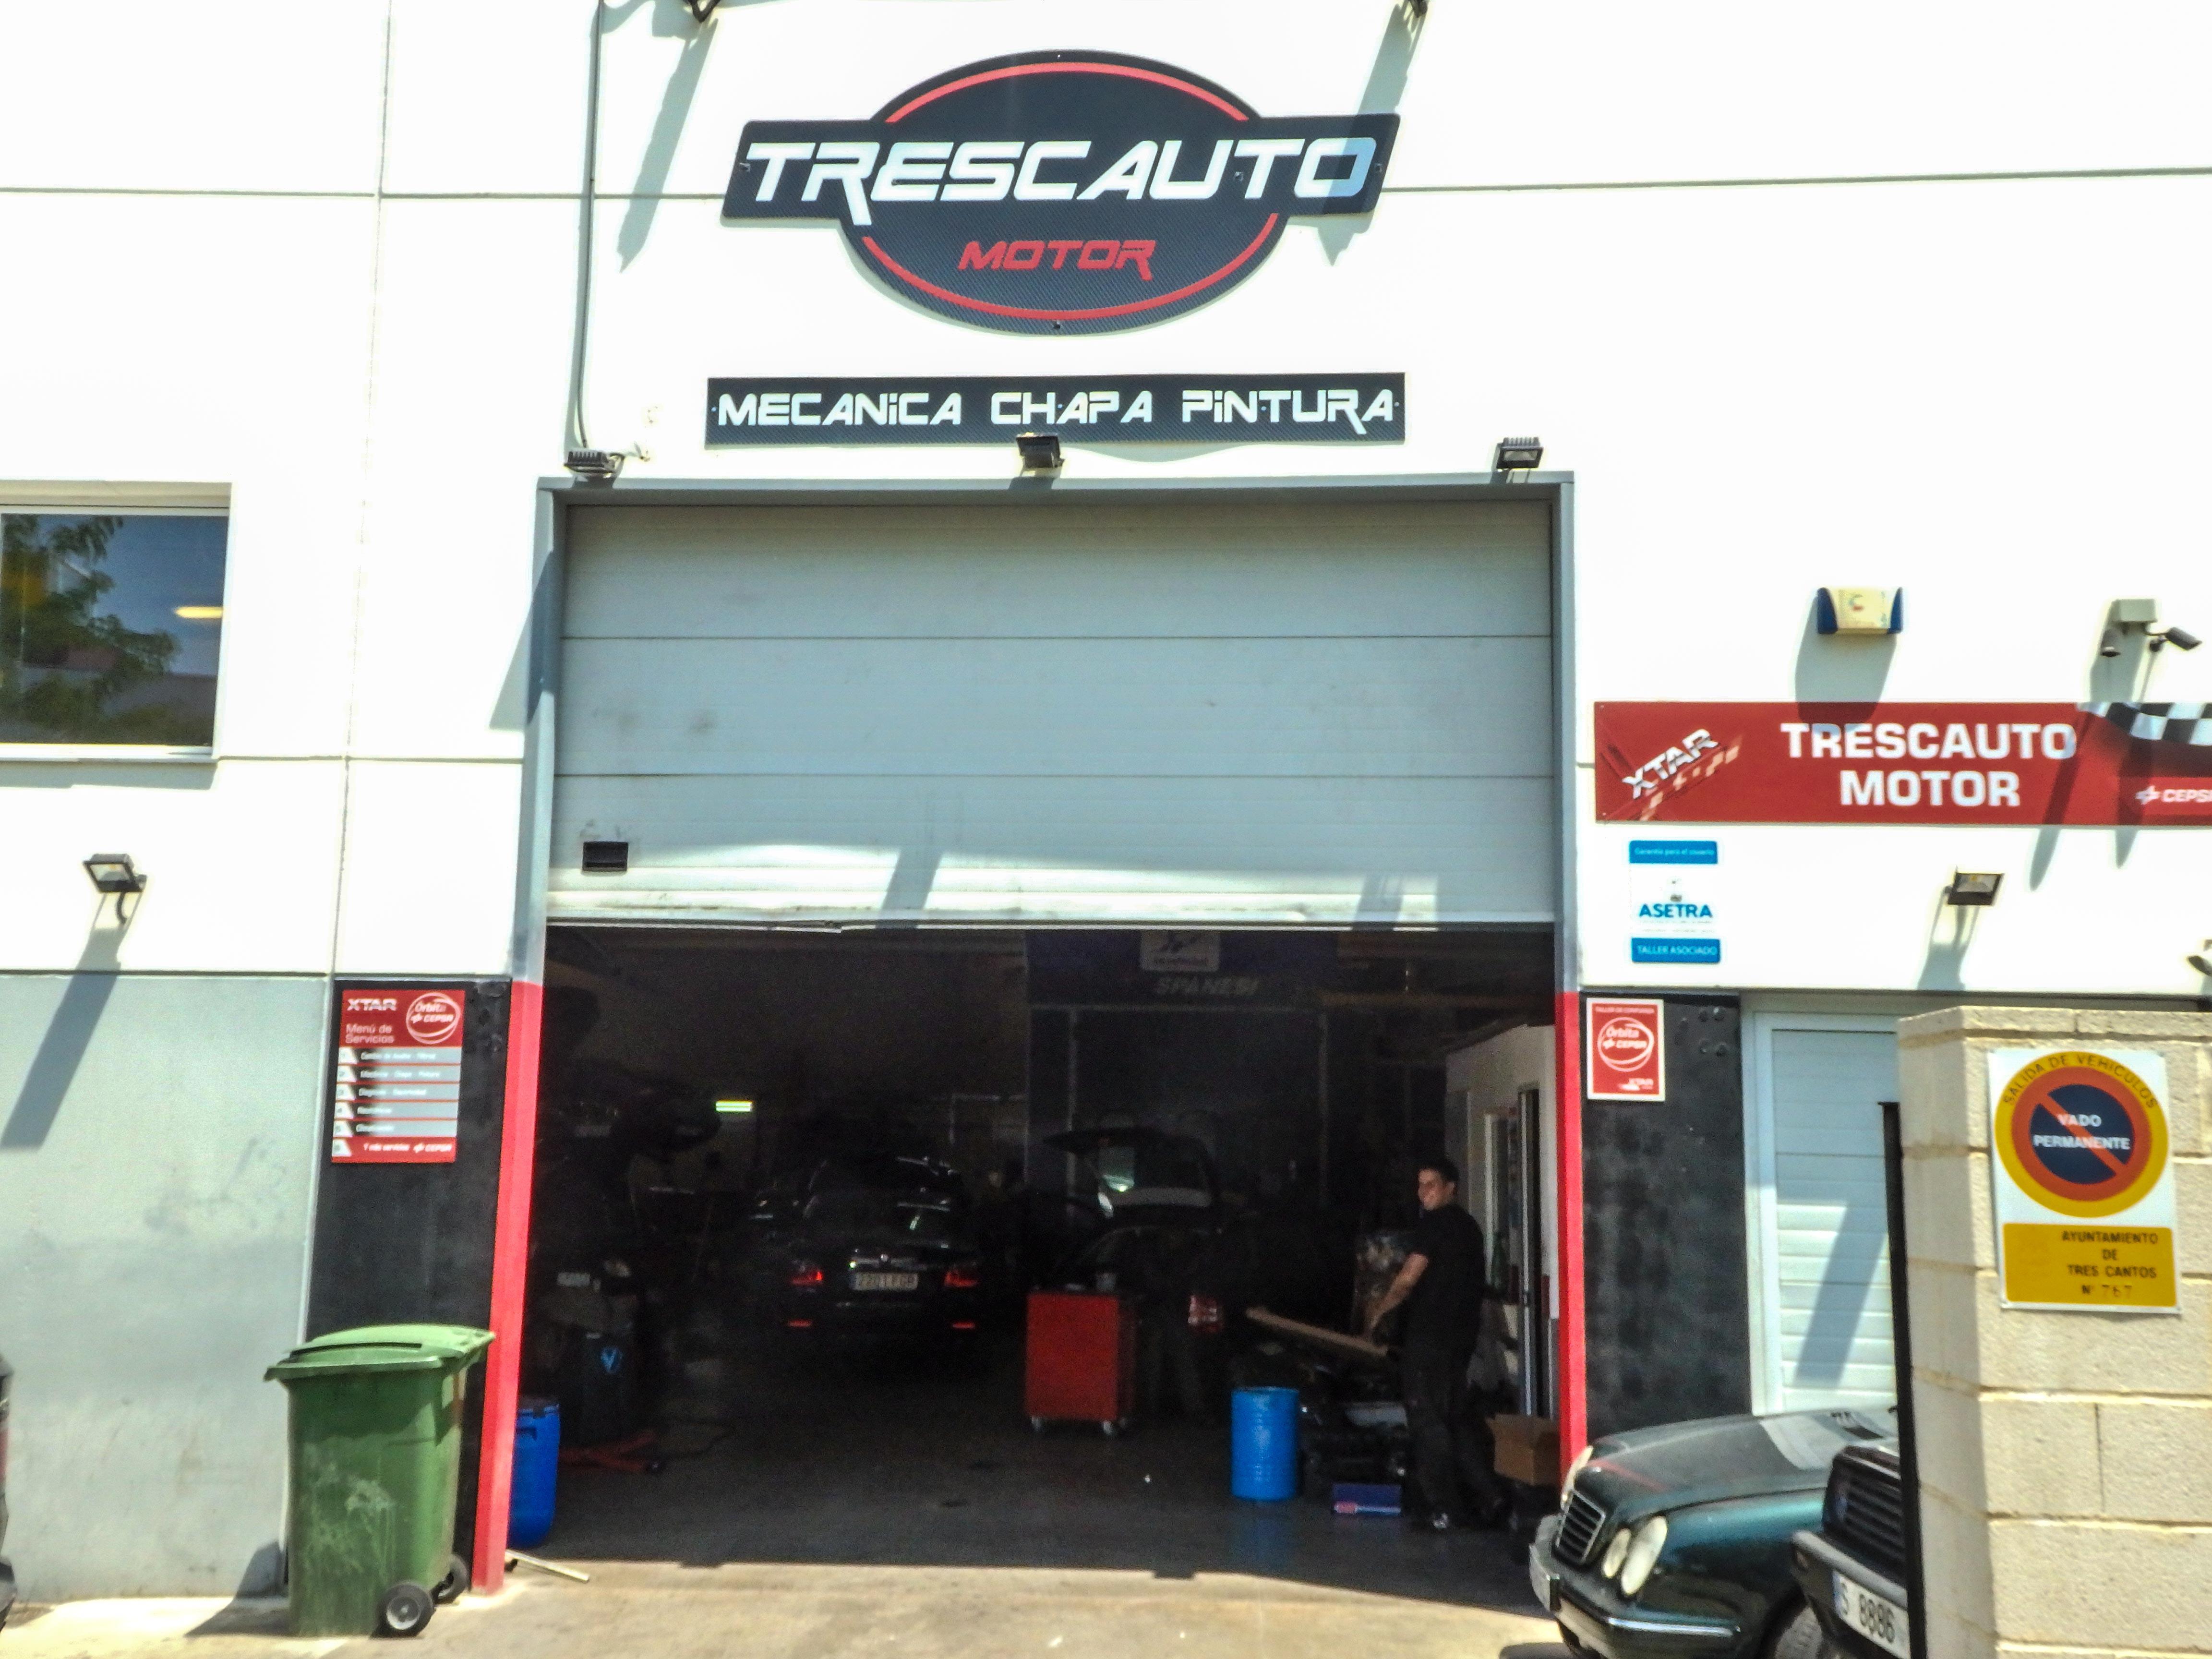 Trescauto motor taller mecanico y de pintura en tres cantos - Fachadas de talleres ...